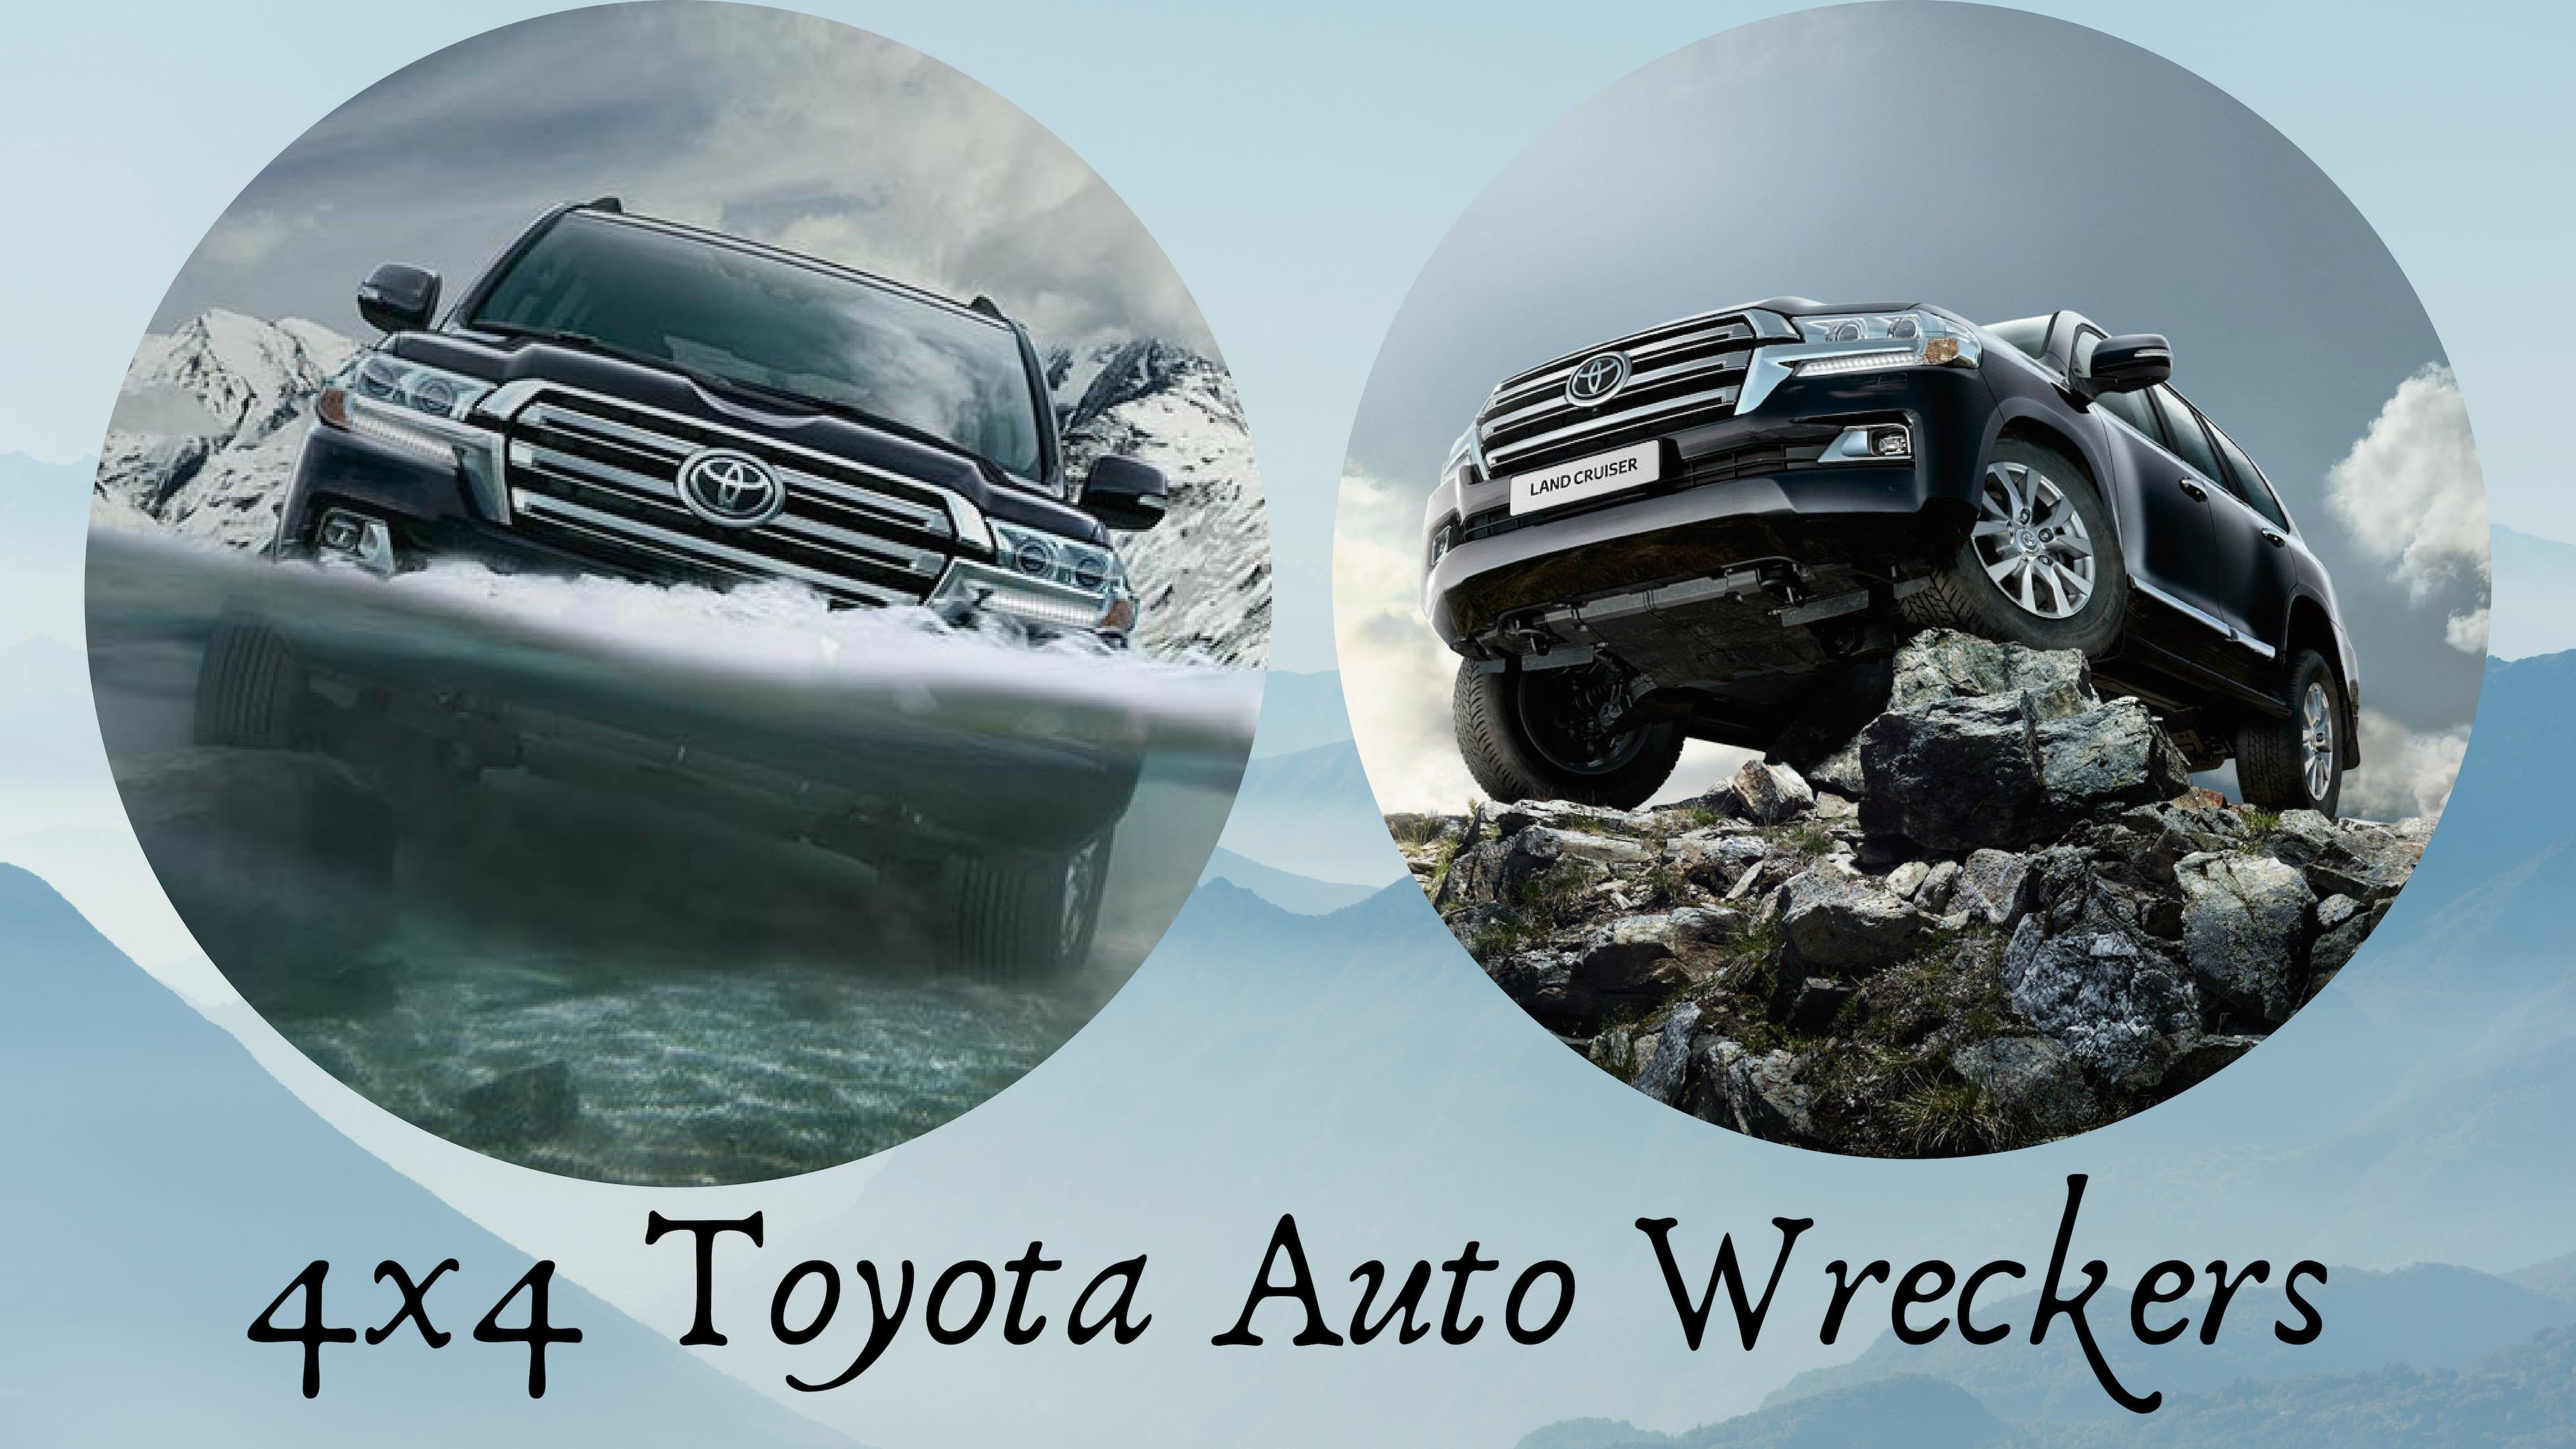 4x4 Toyota Auto Wreckers